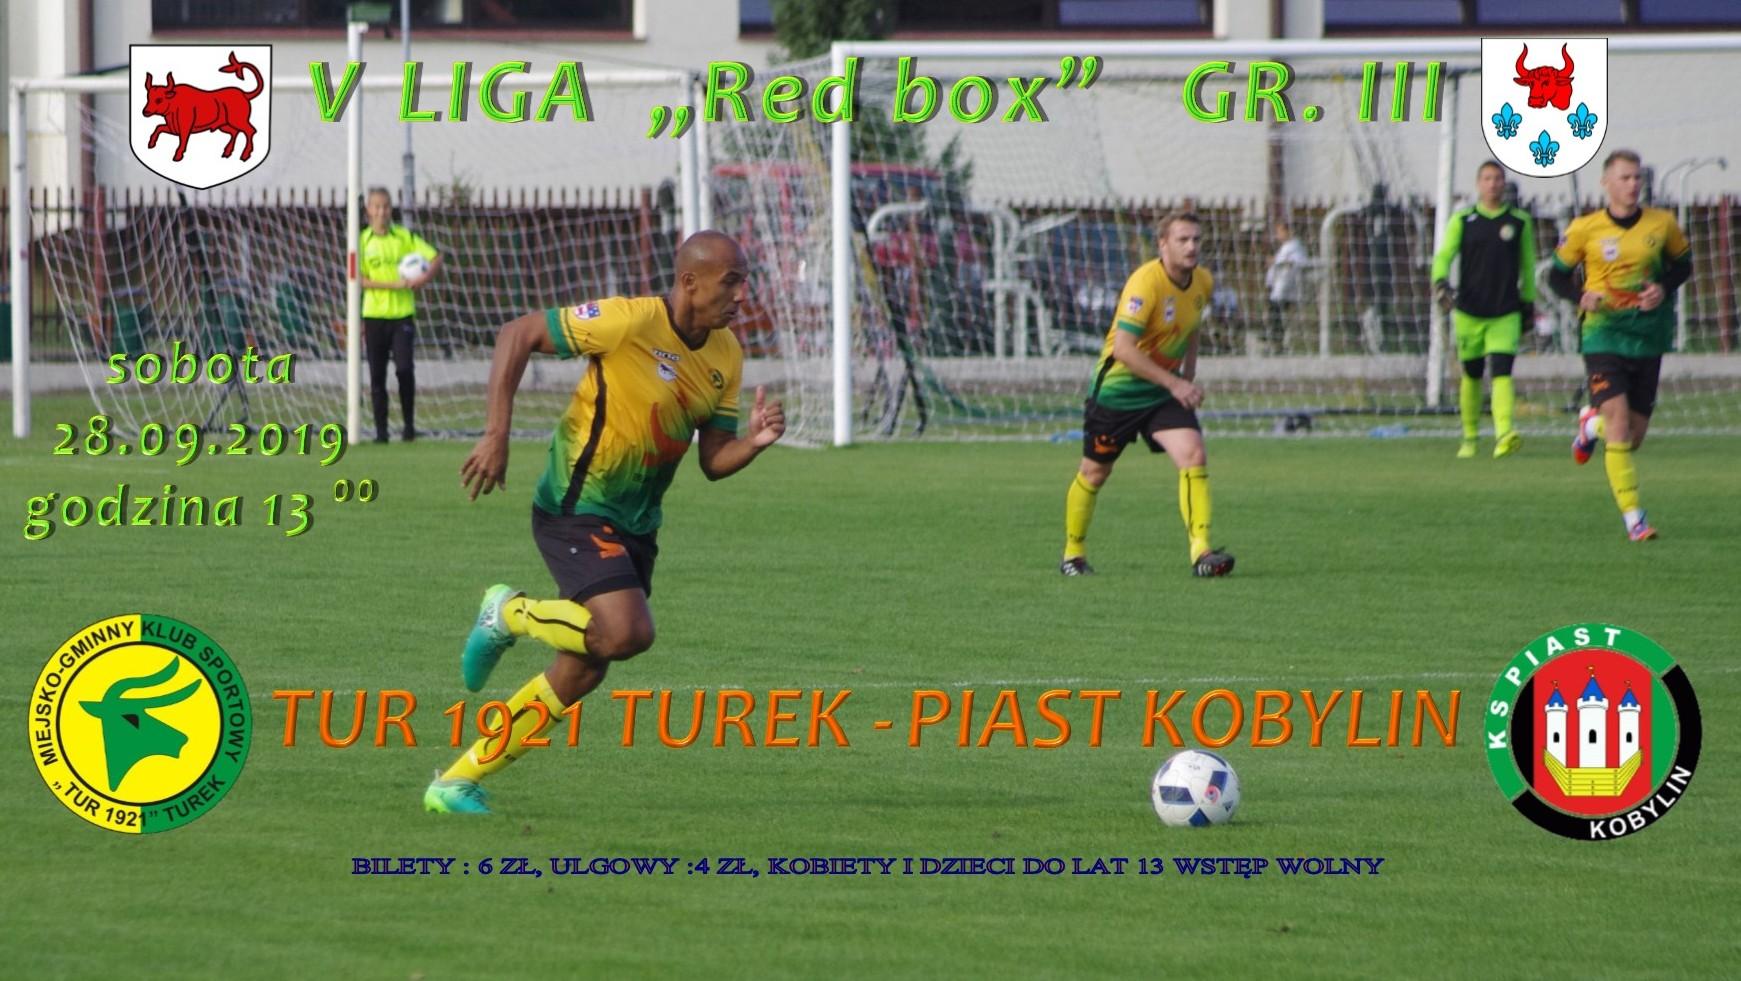 Tur 1921 Turek- Piast Kobylin, V liga